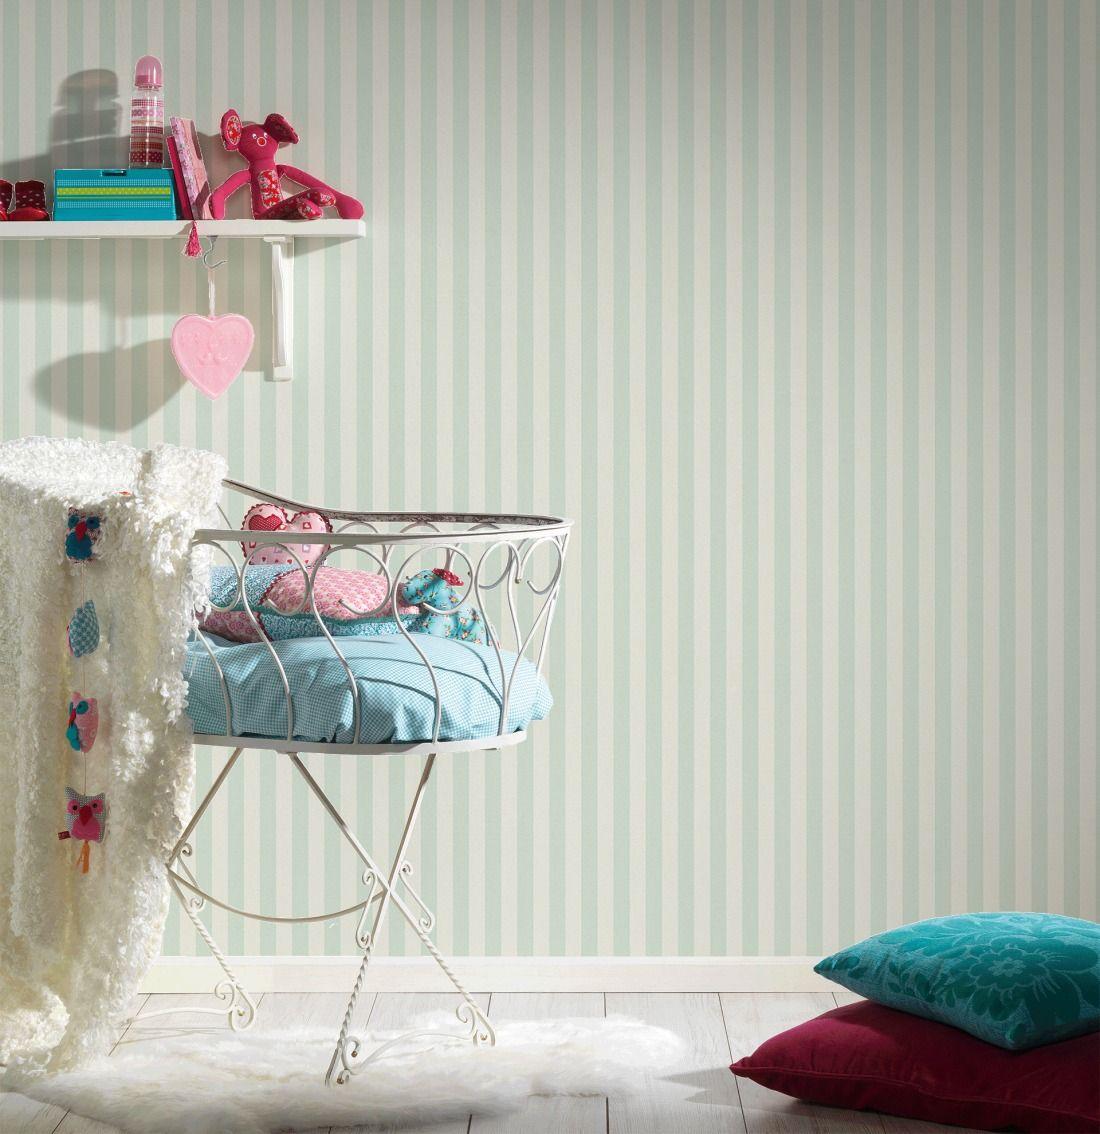 Tapeten im Kinderzimmer; Esprit home Tapete 302961 | Tapete ...